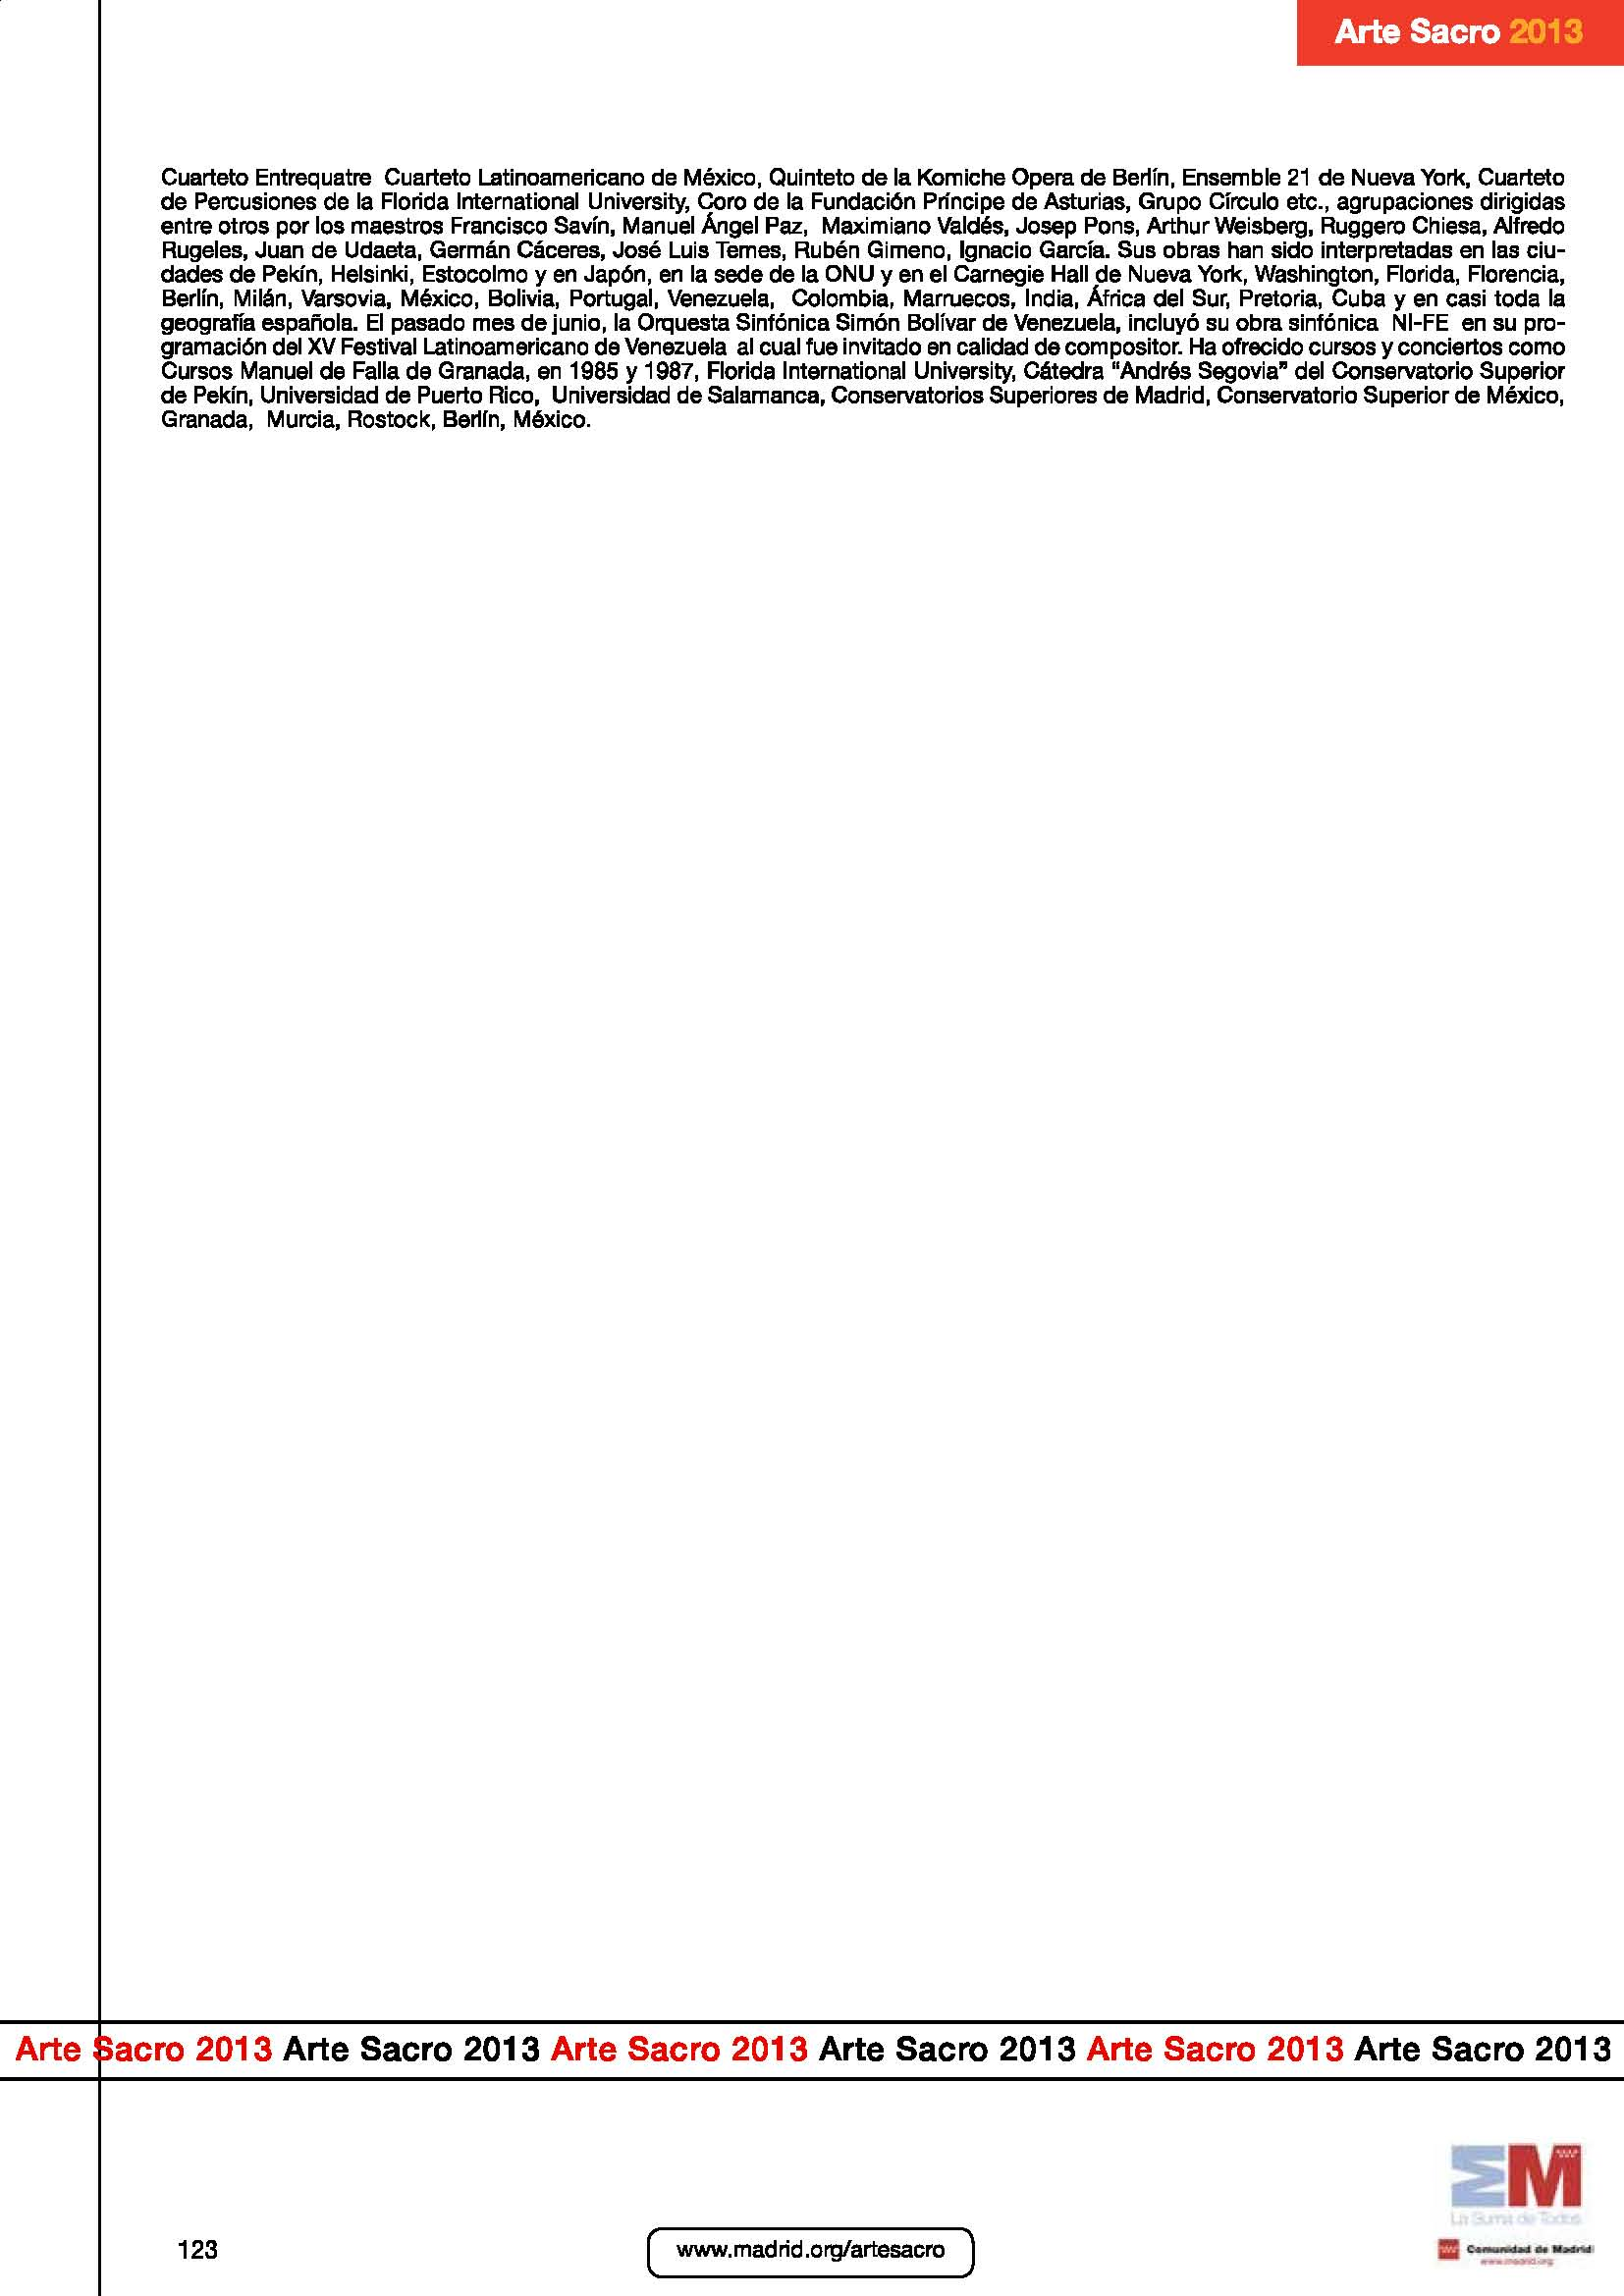 dossier_completo_Página_123